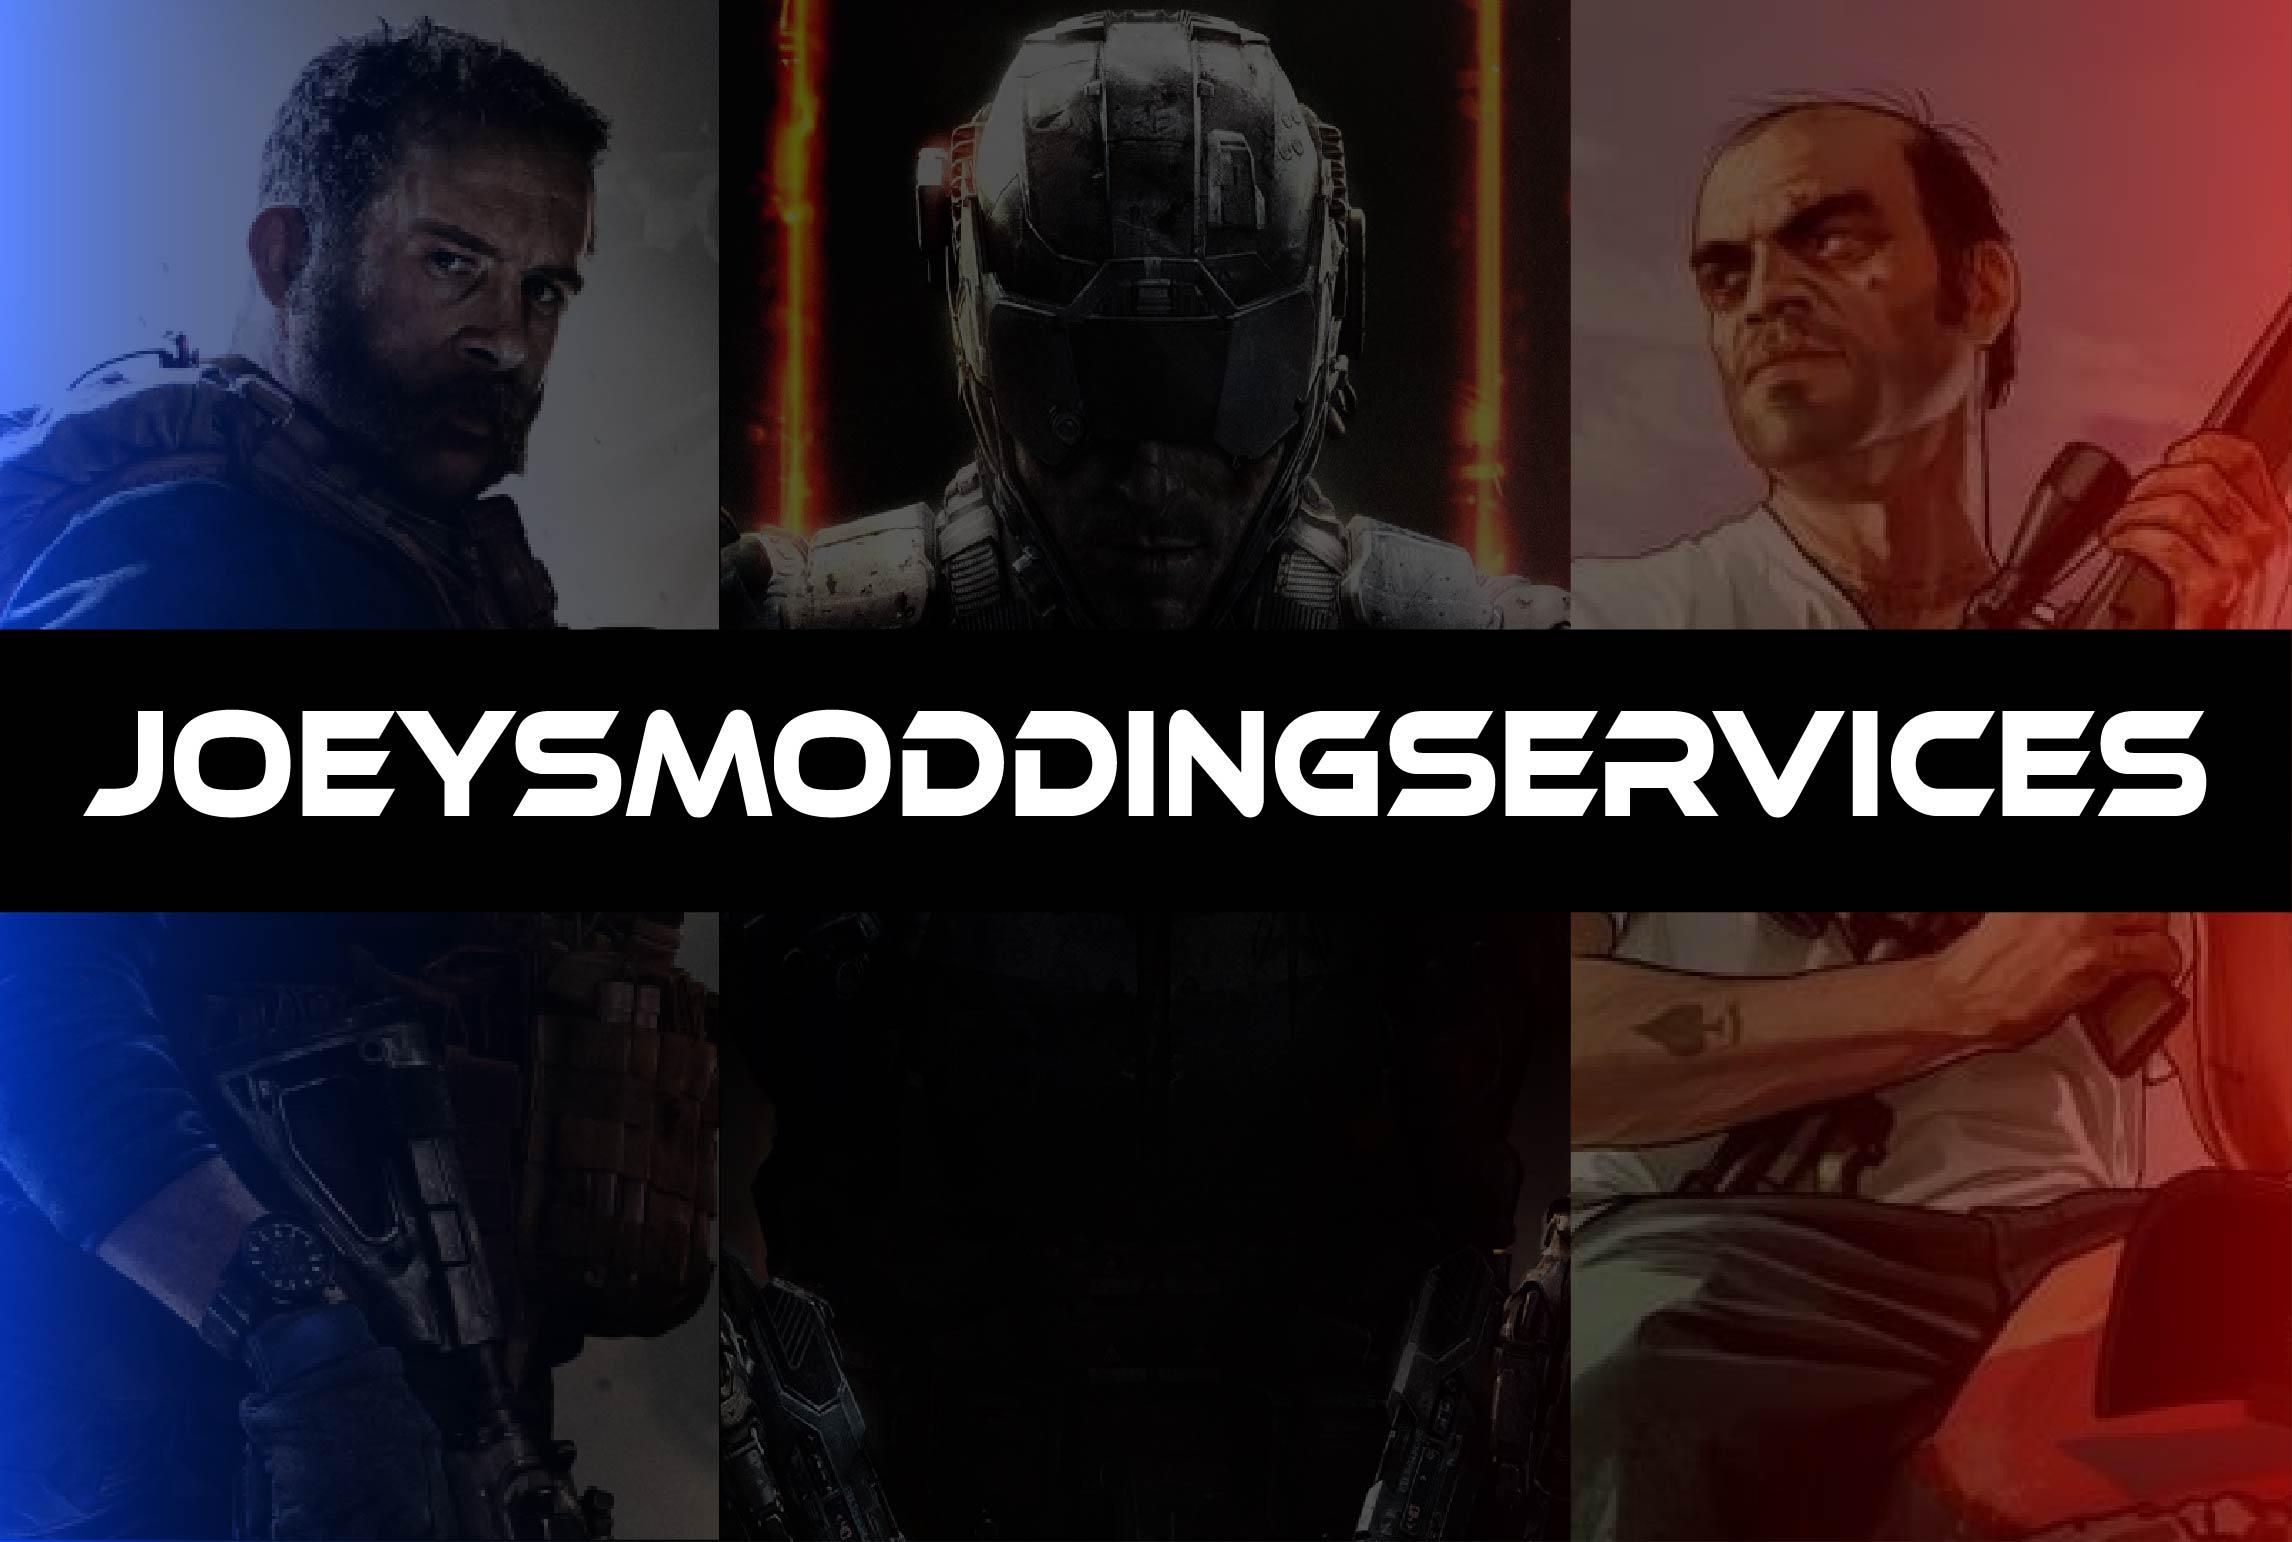 JoeysModdingServices-01.jpg